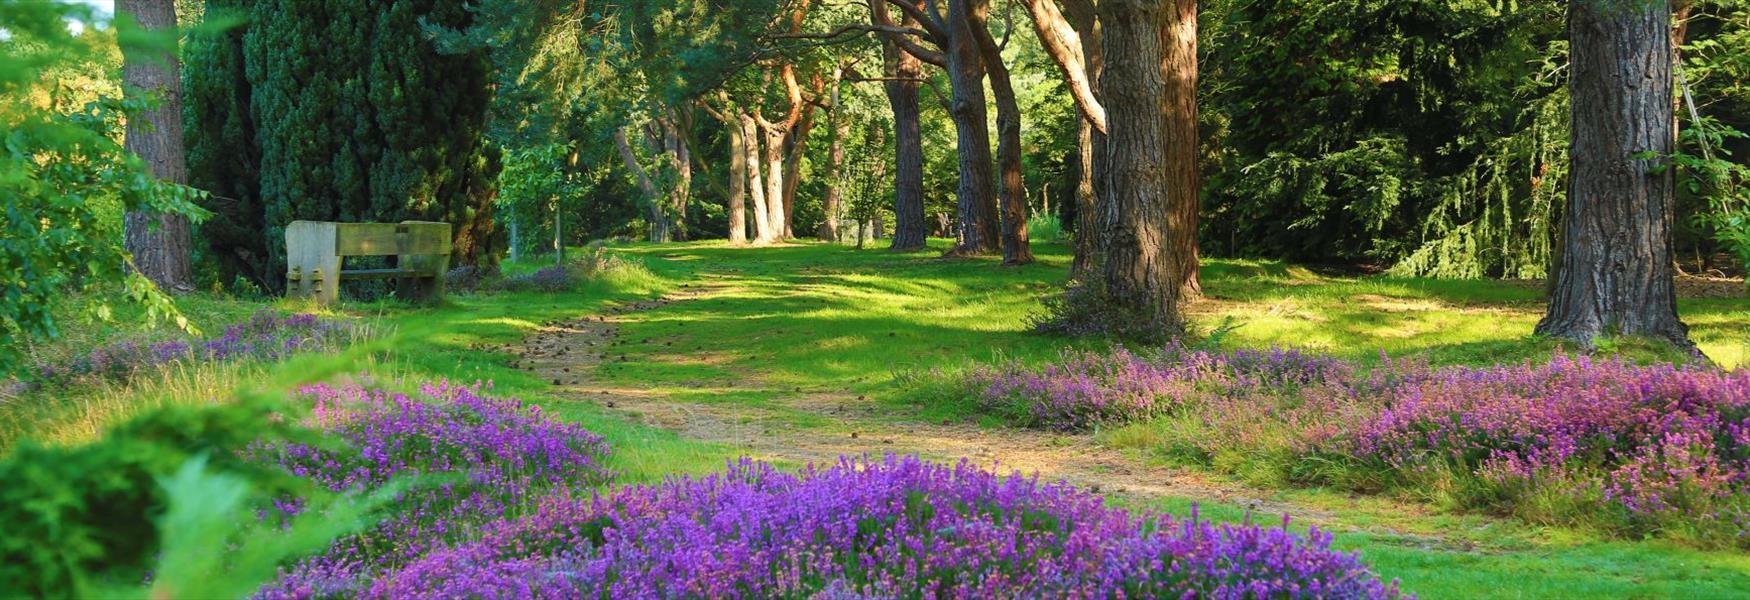 Windsor Great Park's Heather Garden